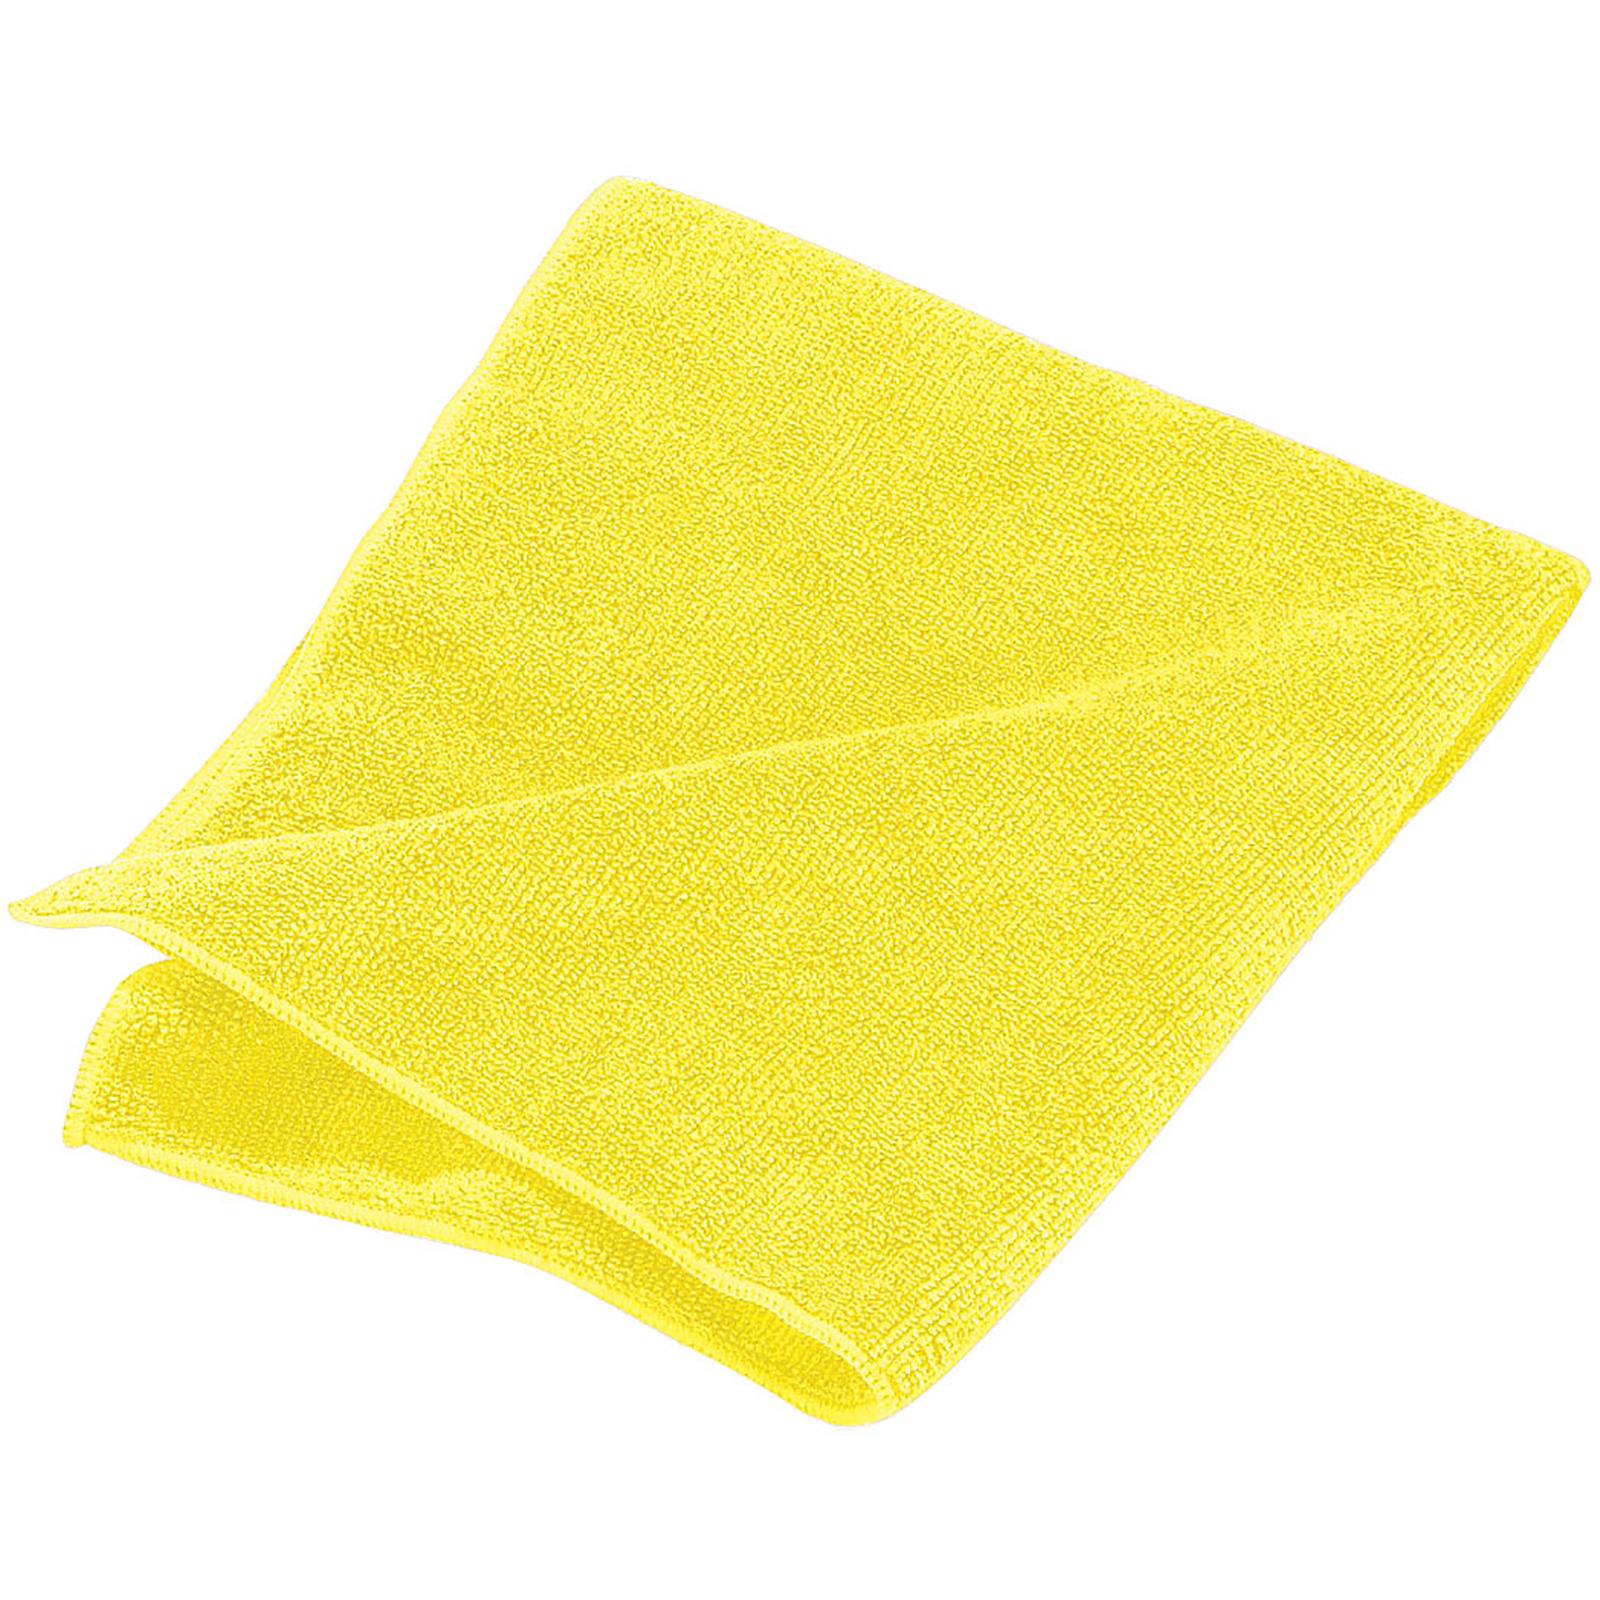 Carlisle 3633404 towel / cloth / mitts, microfiber